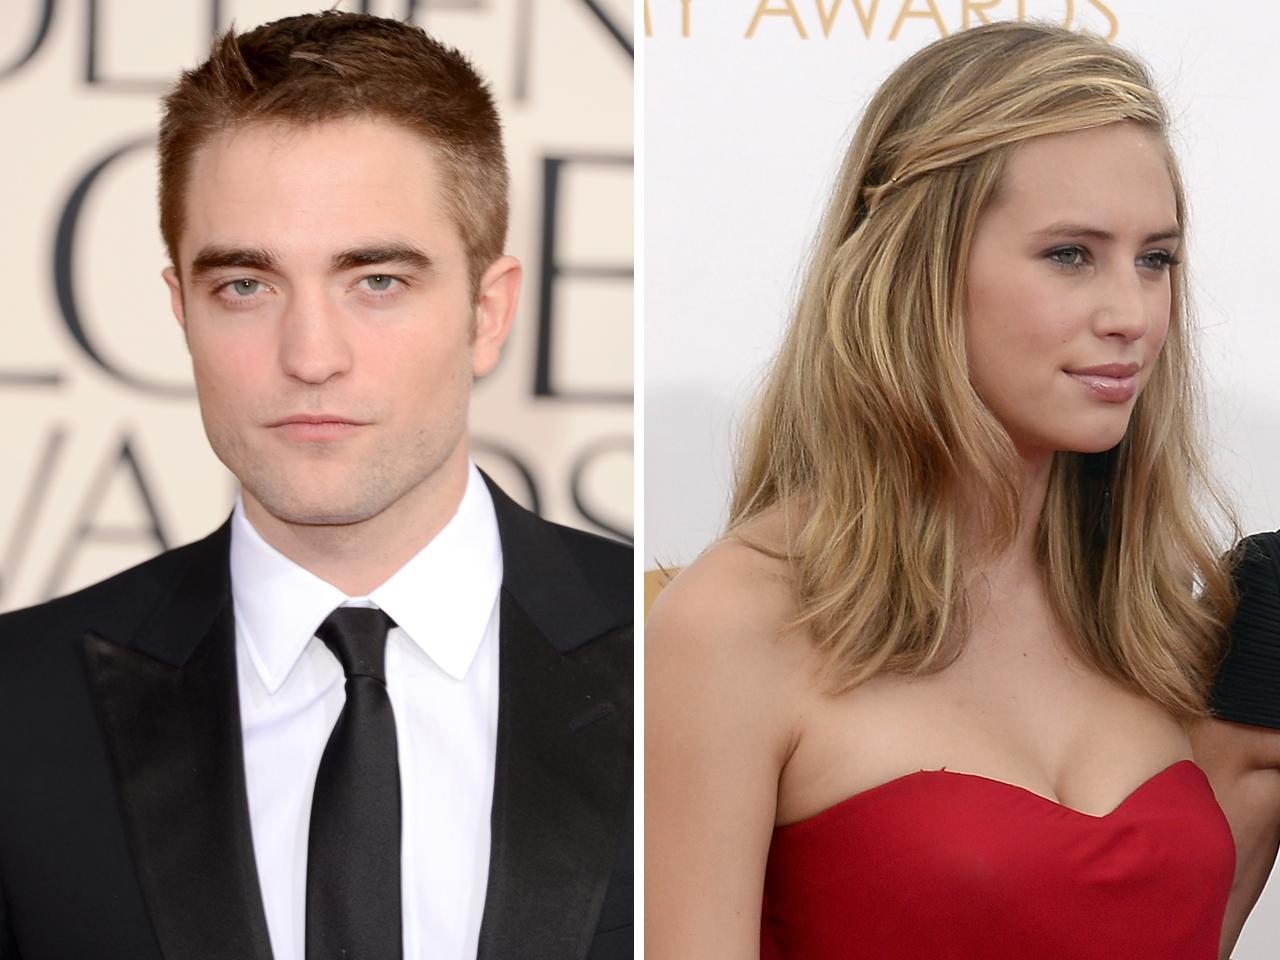 Robert Pattinson dating Dylan dating for intelligente singler UK